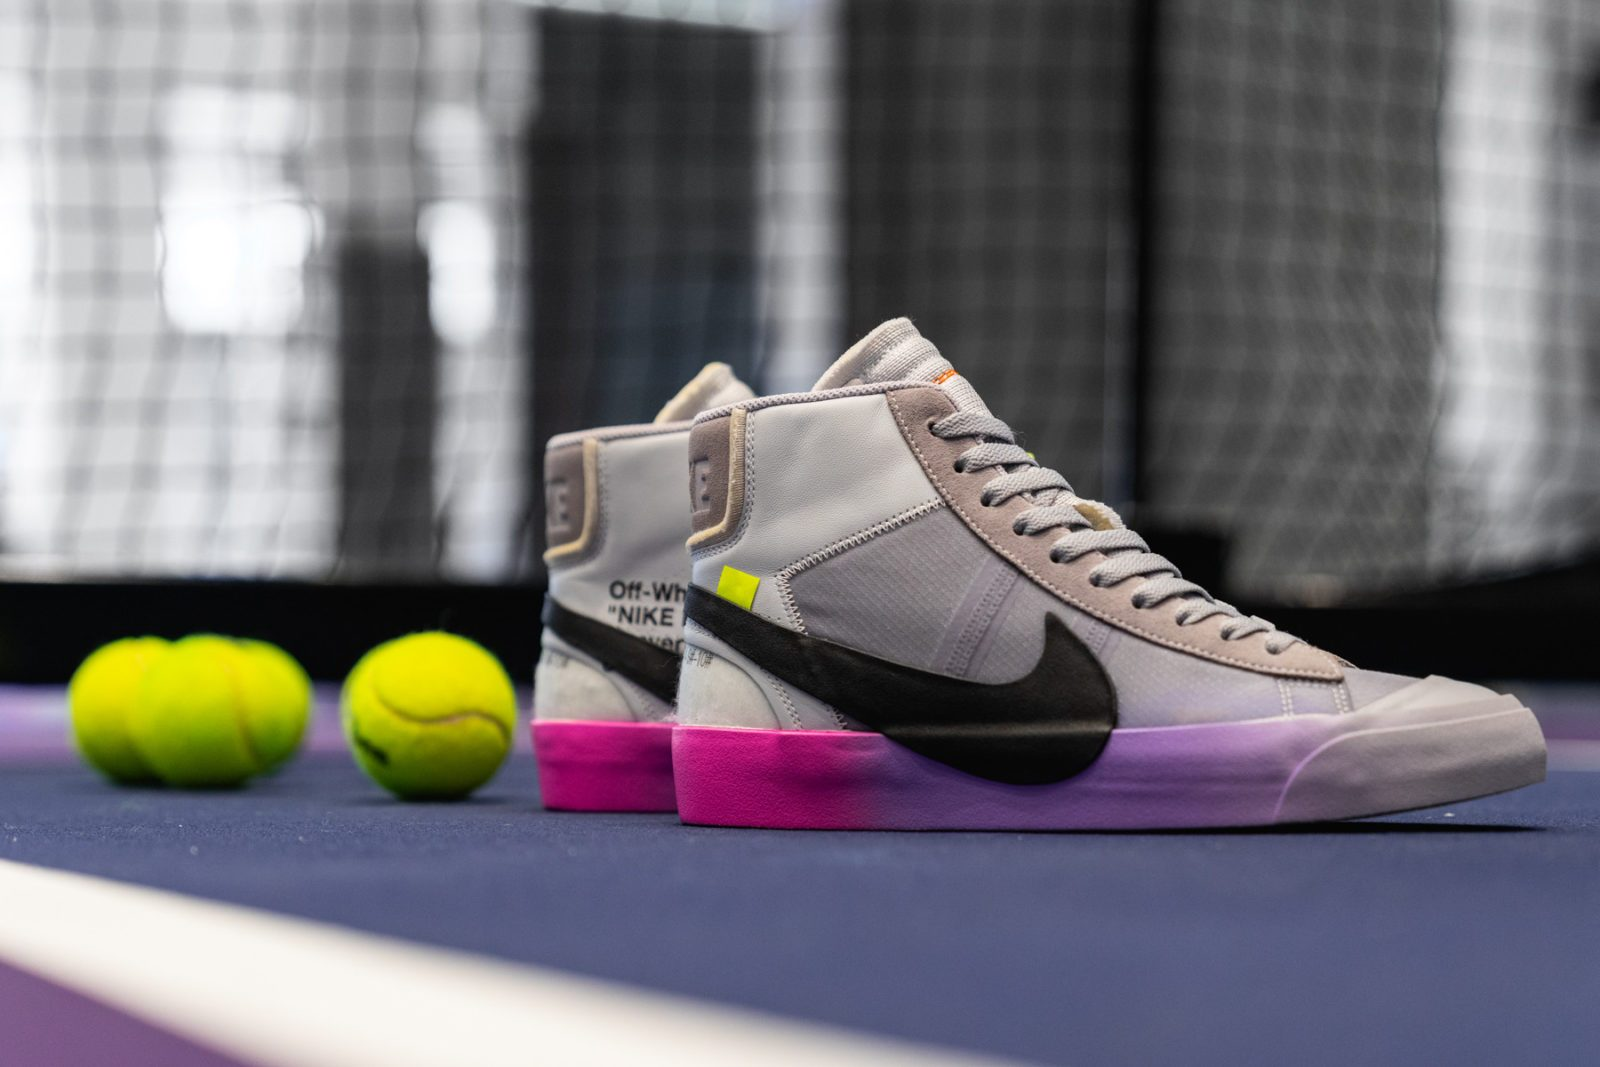 Off-White x Serena Williams x Nike